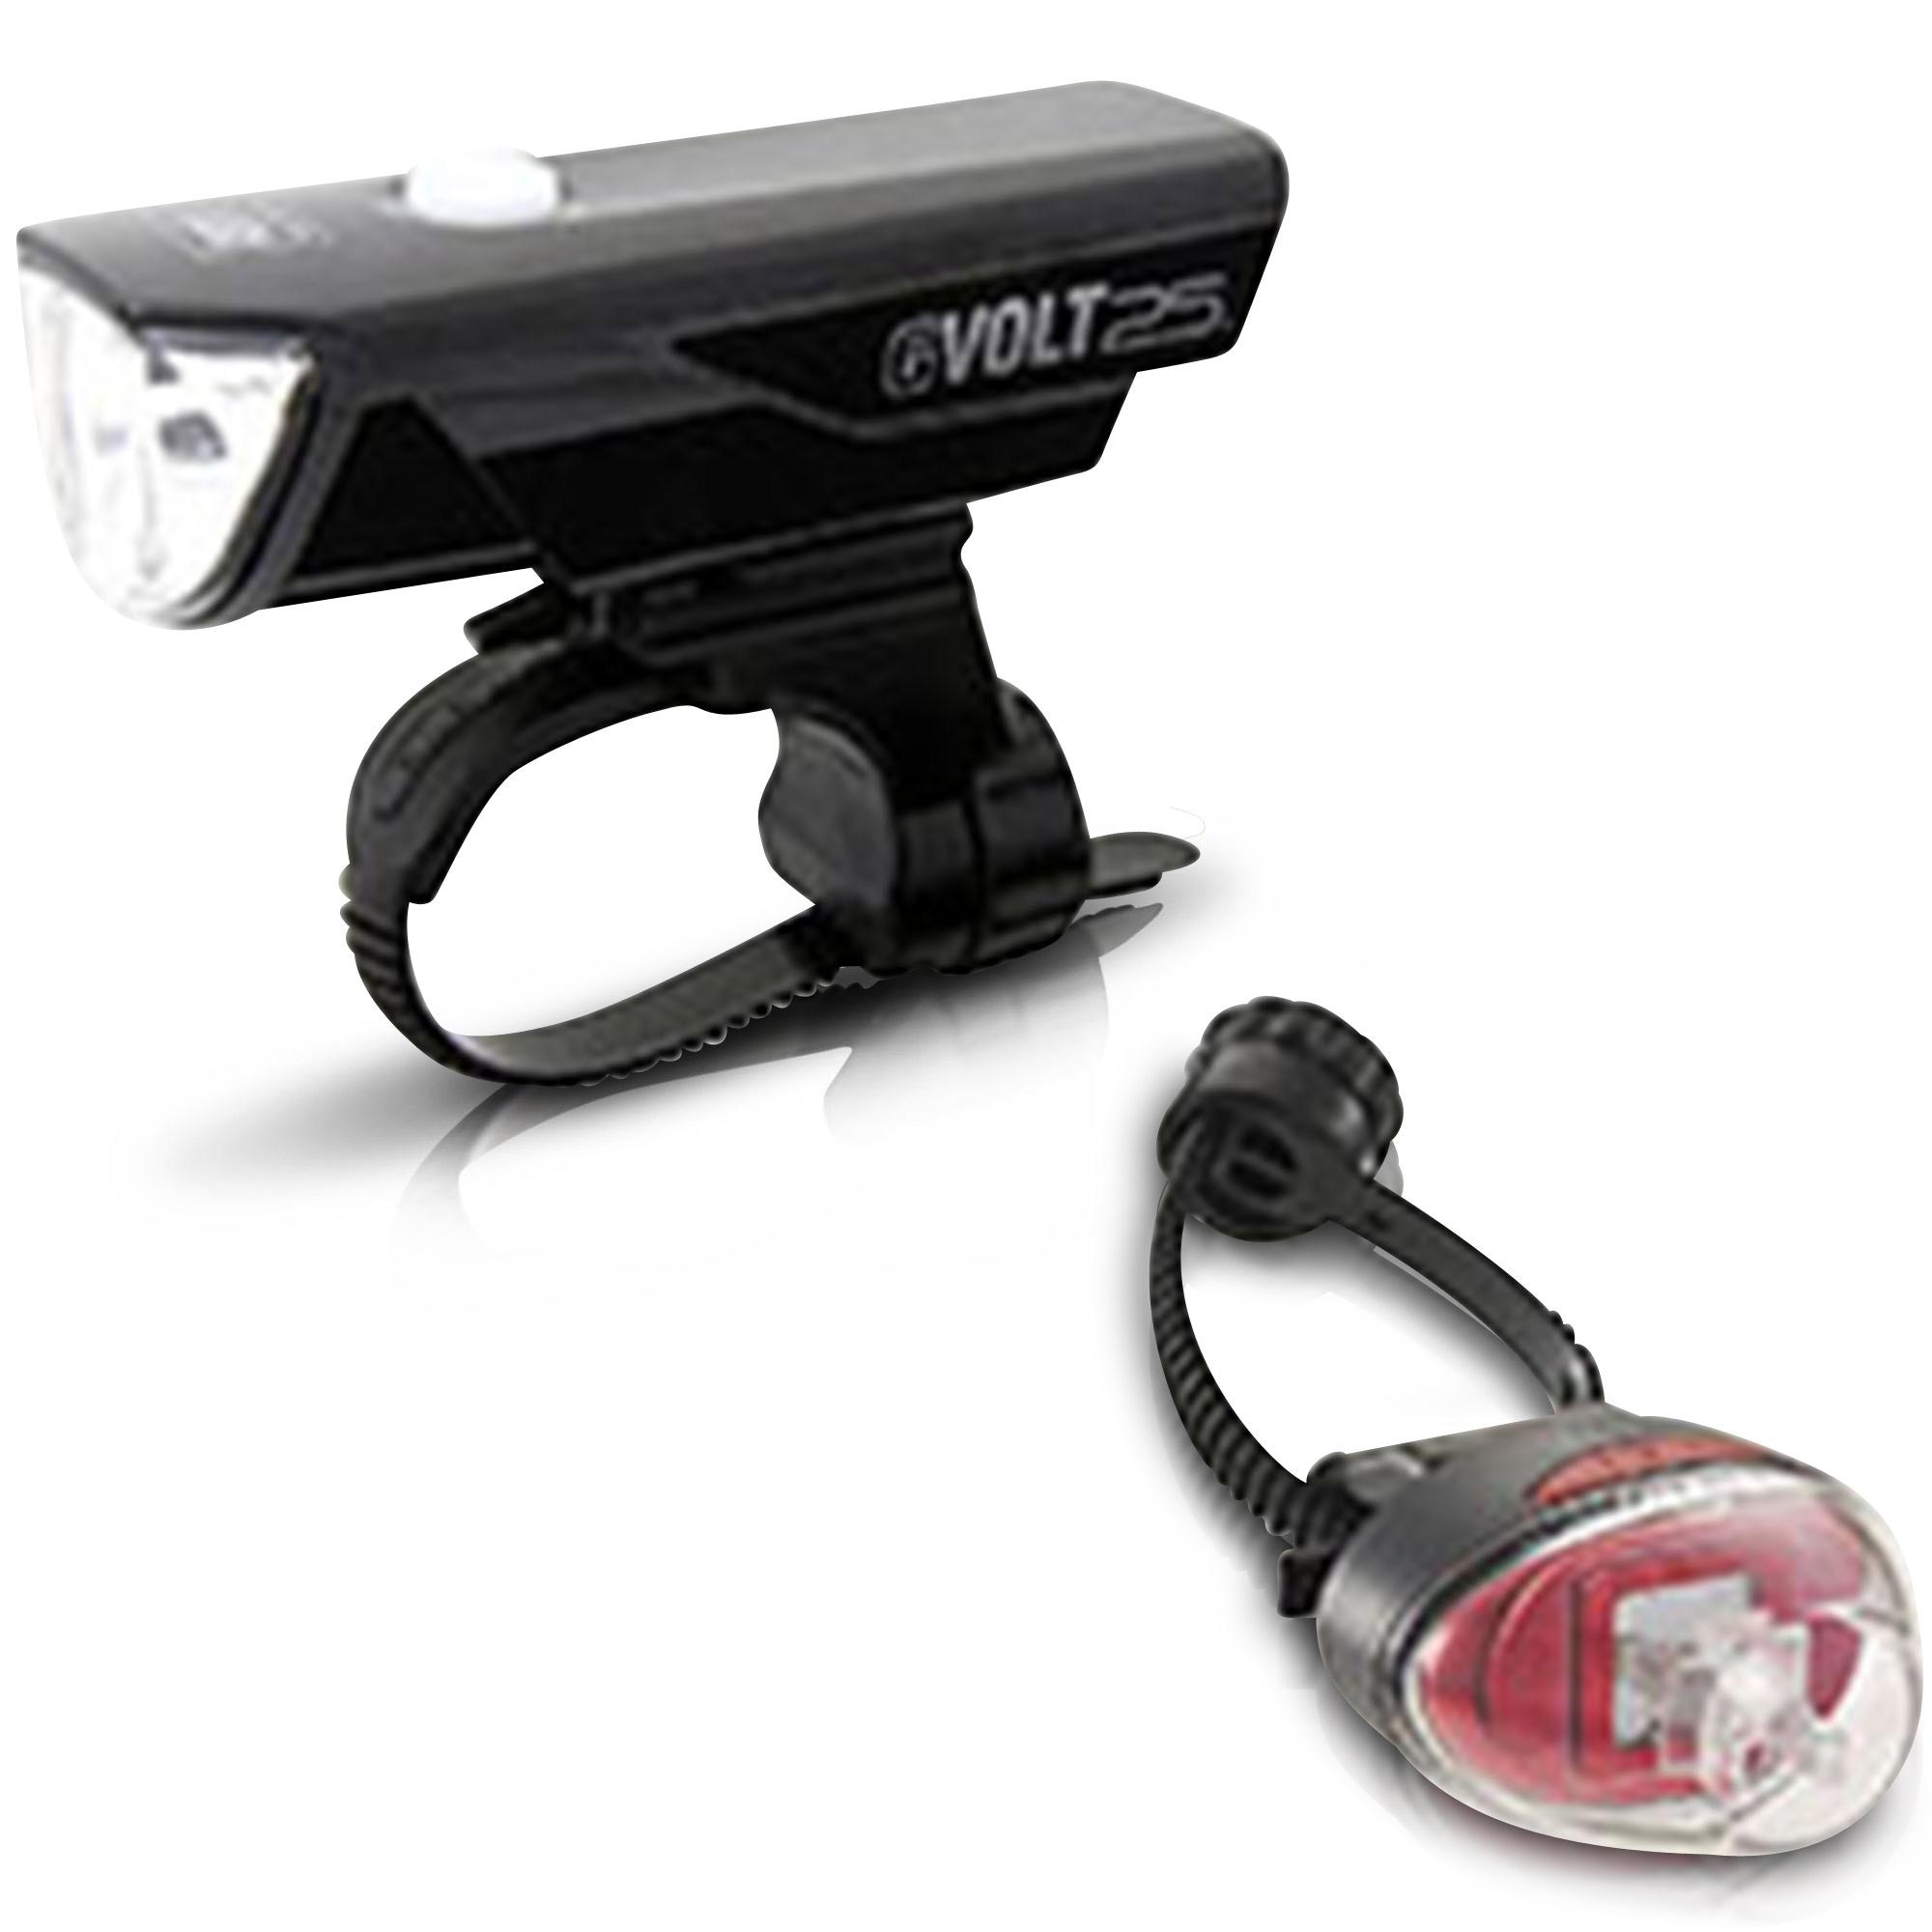 CatEye Co., LTD Cateye GVolt 25 RC Kit - HL-EL360GRC + TL-LD611G LED-Fahrrad-Lichtset